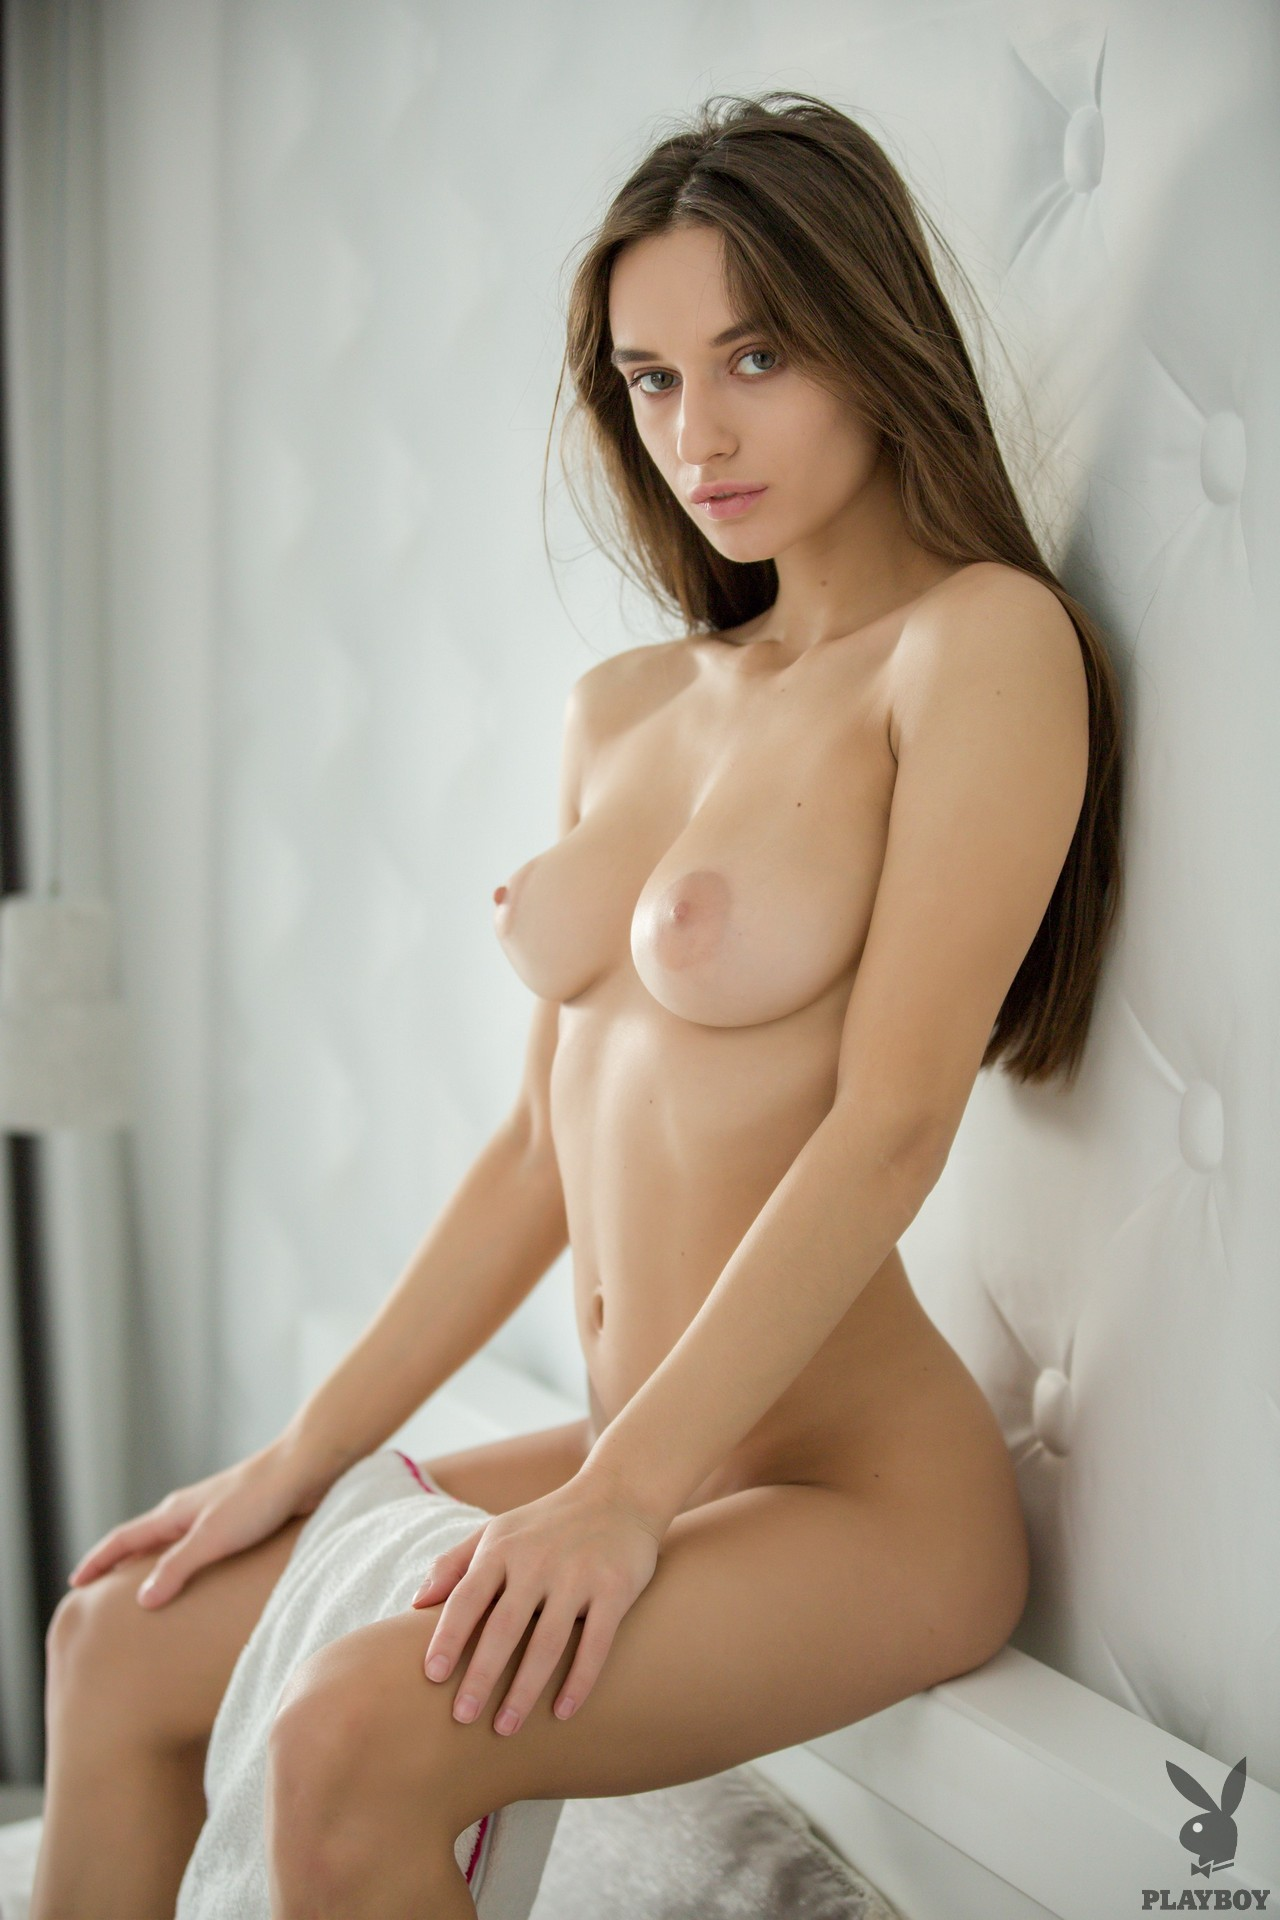 Bella donna porn videos